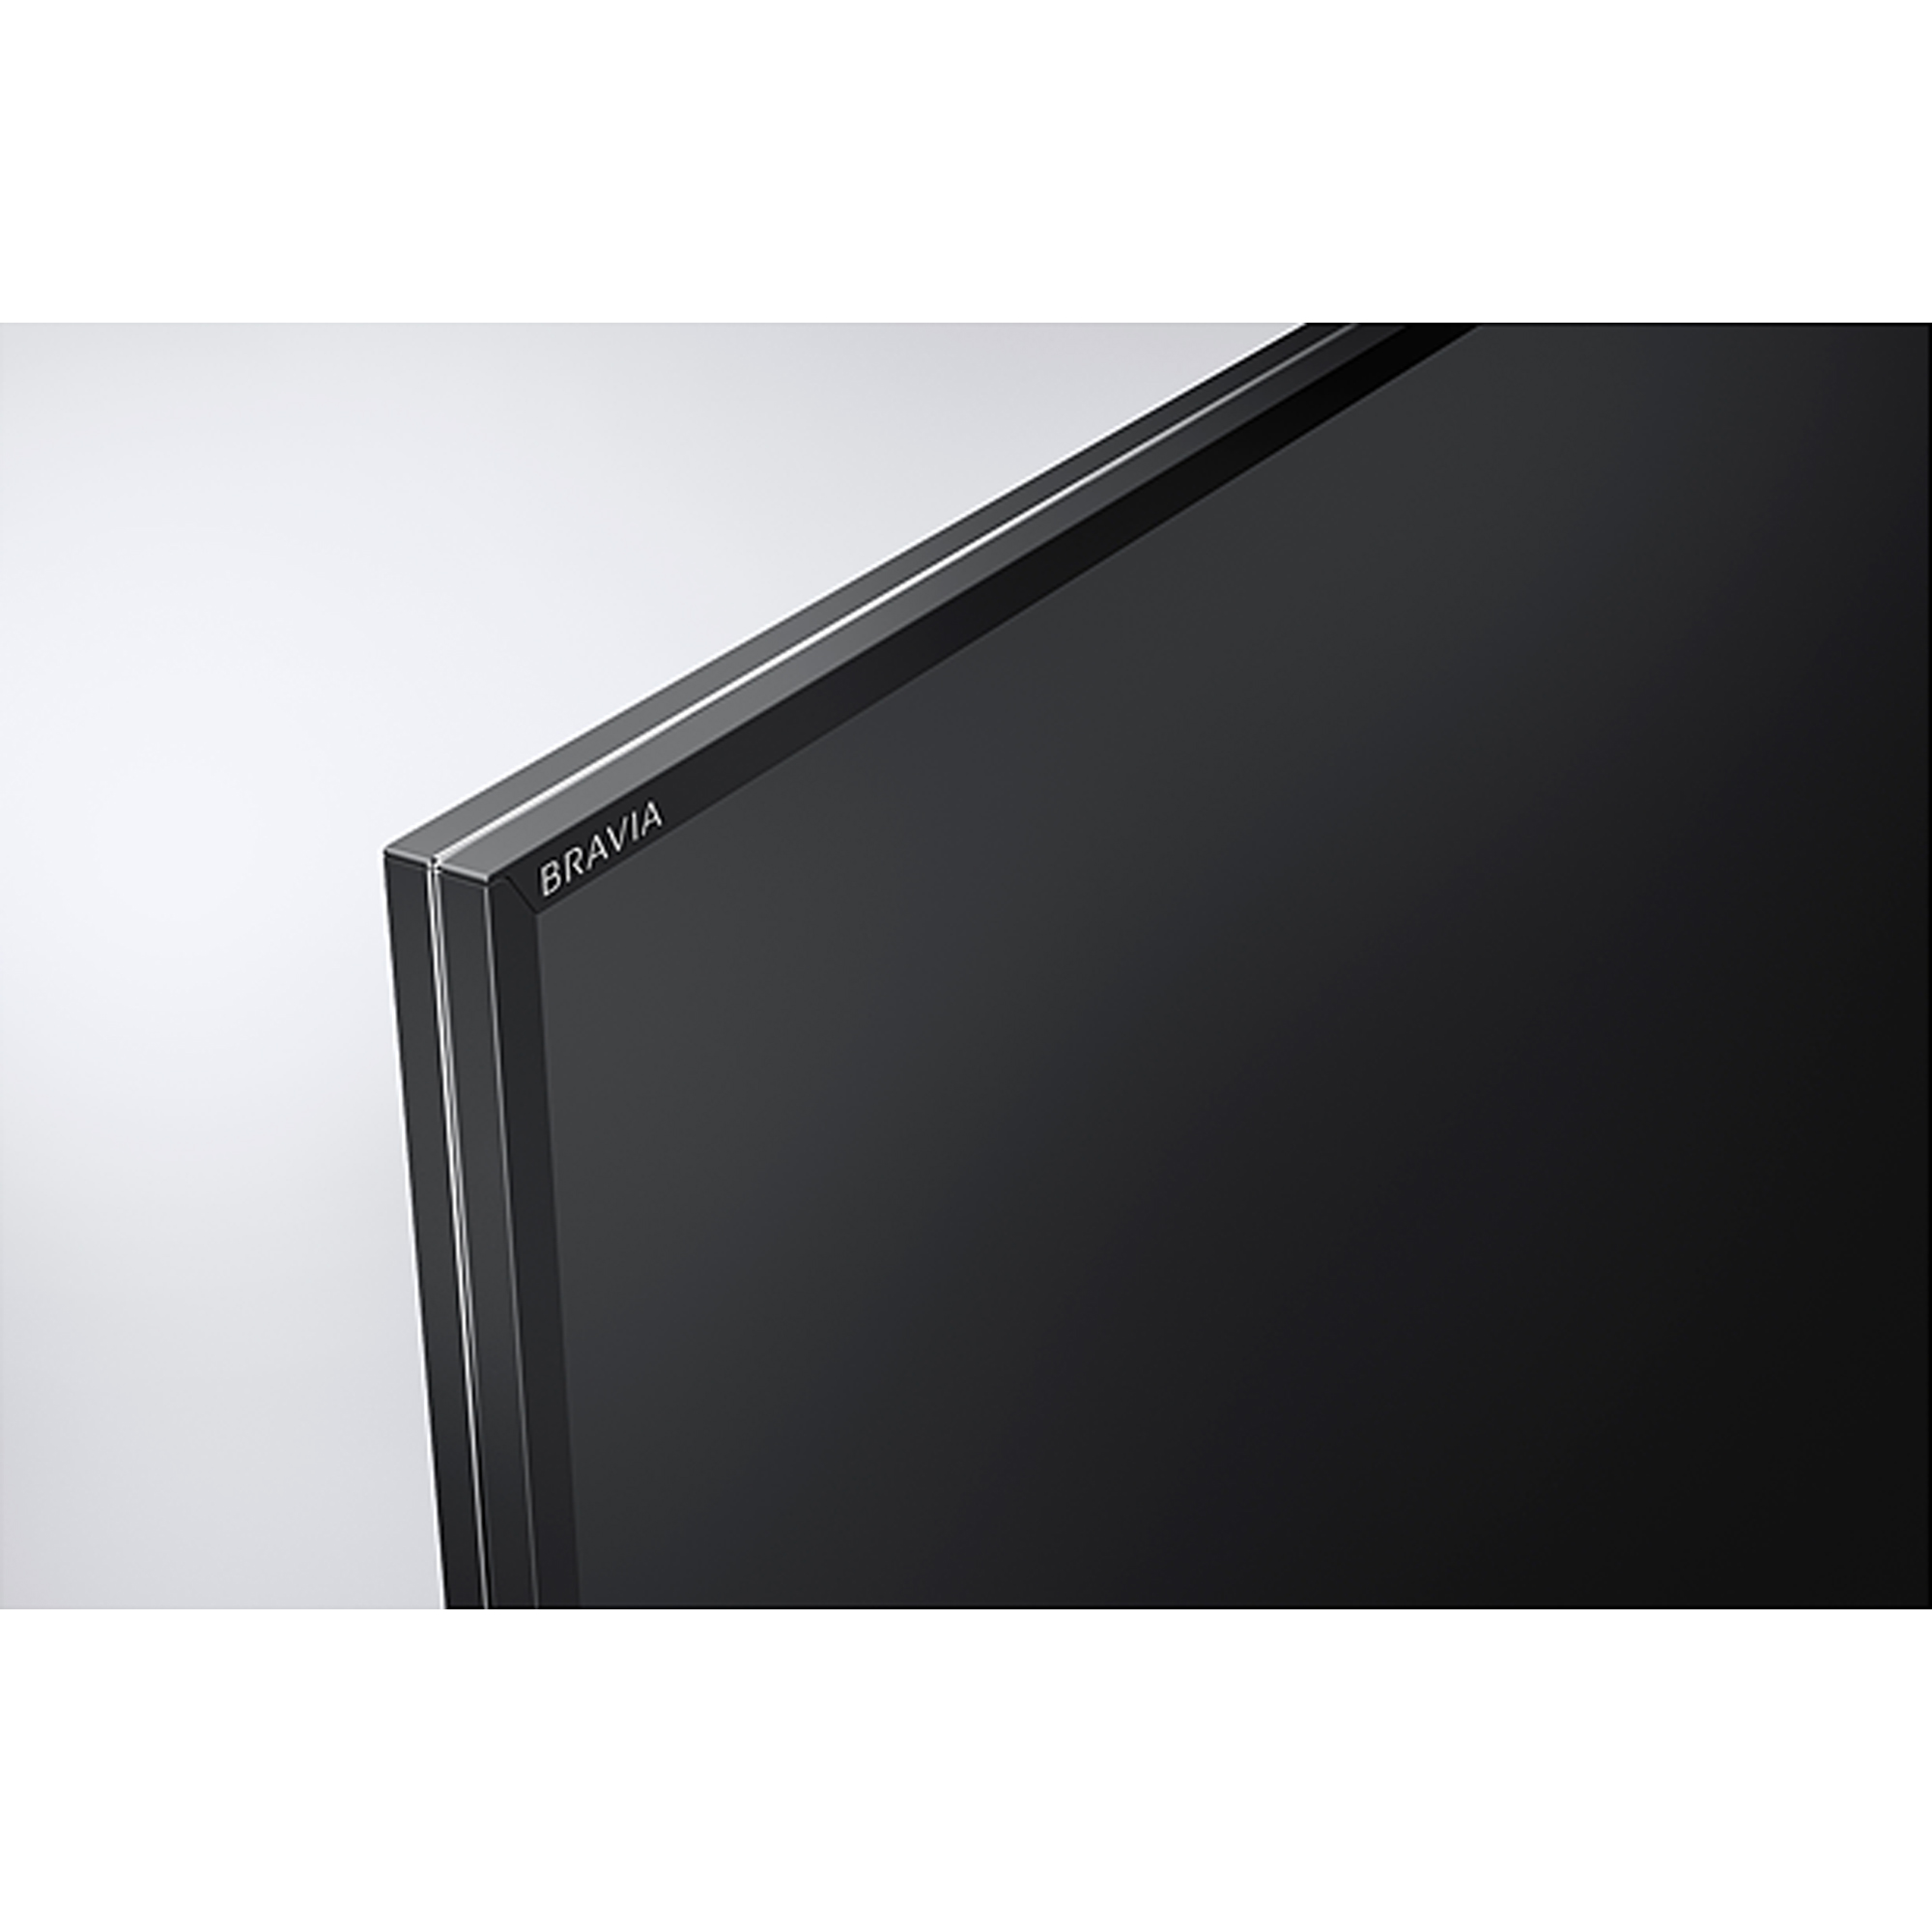 "Sony BRAVIA WD75 Series KDL32WD756 32"" Smart Full HD LED TV"